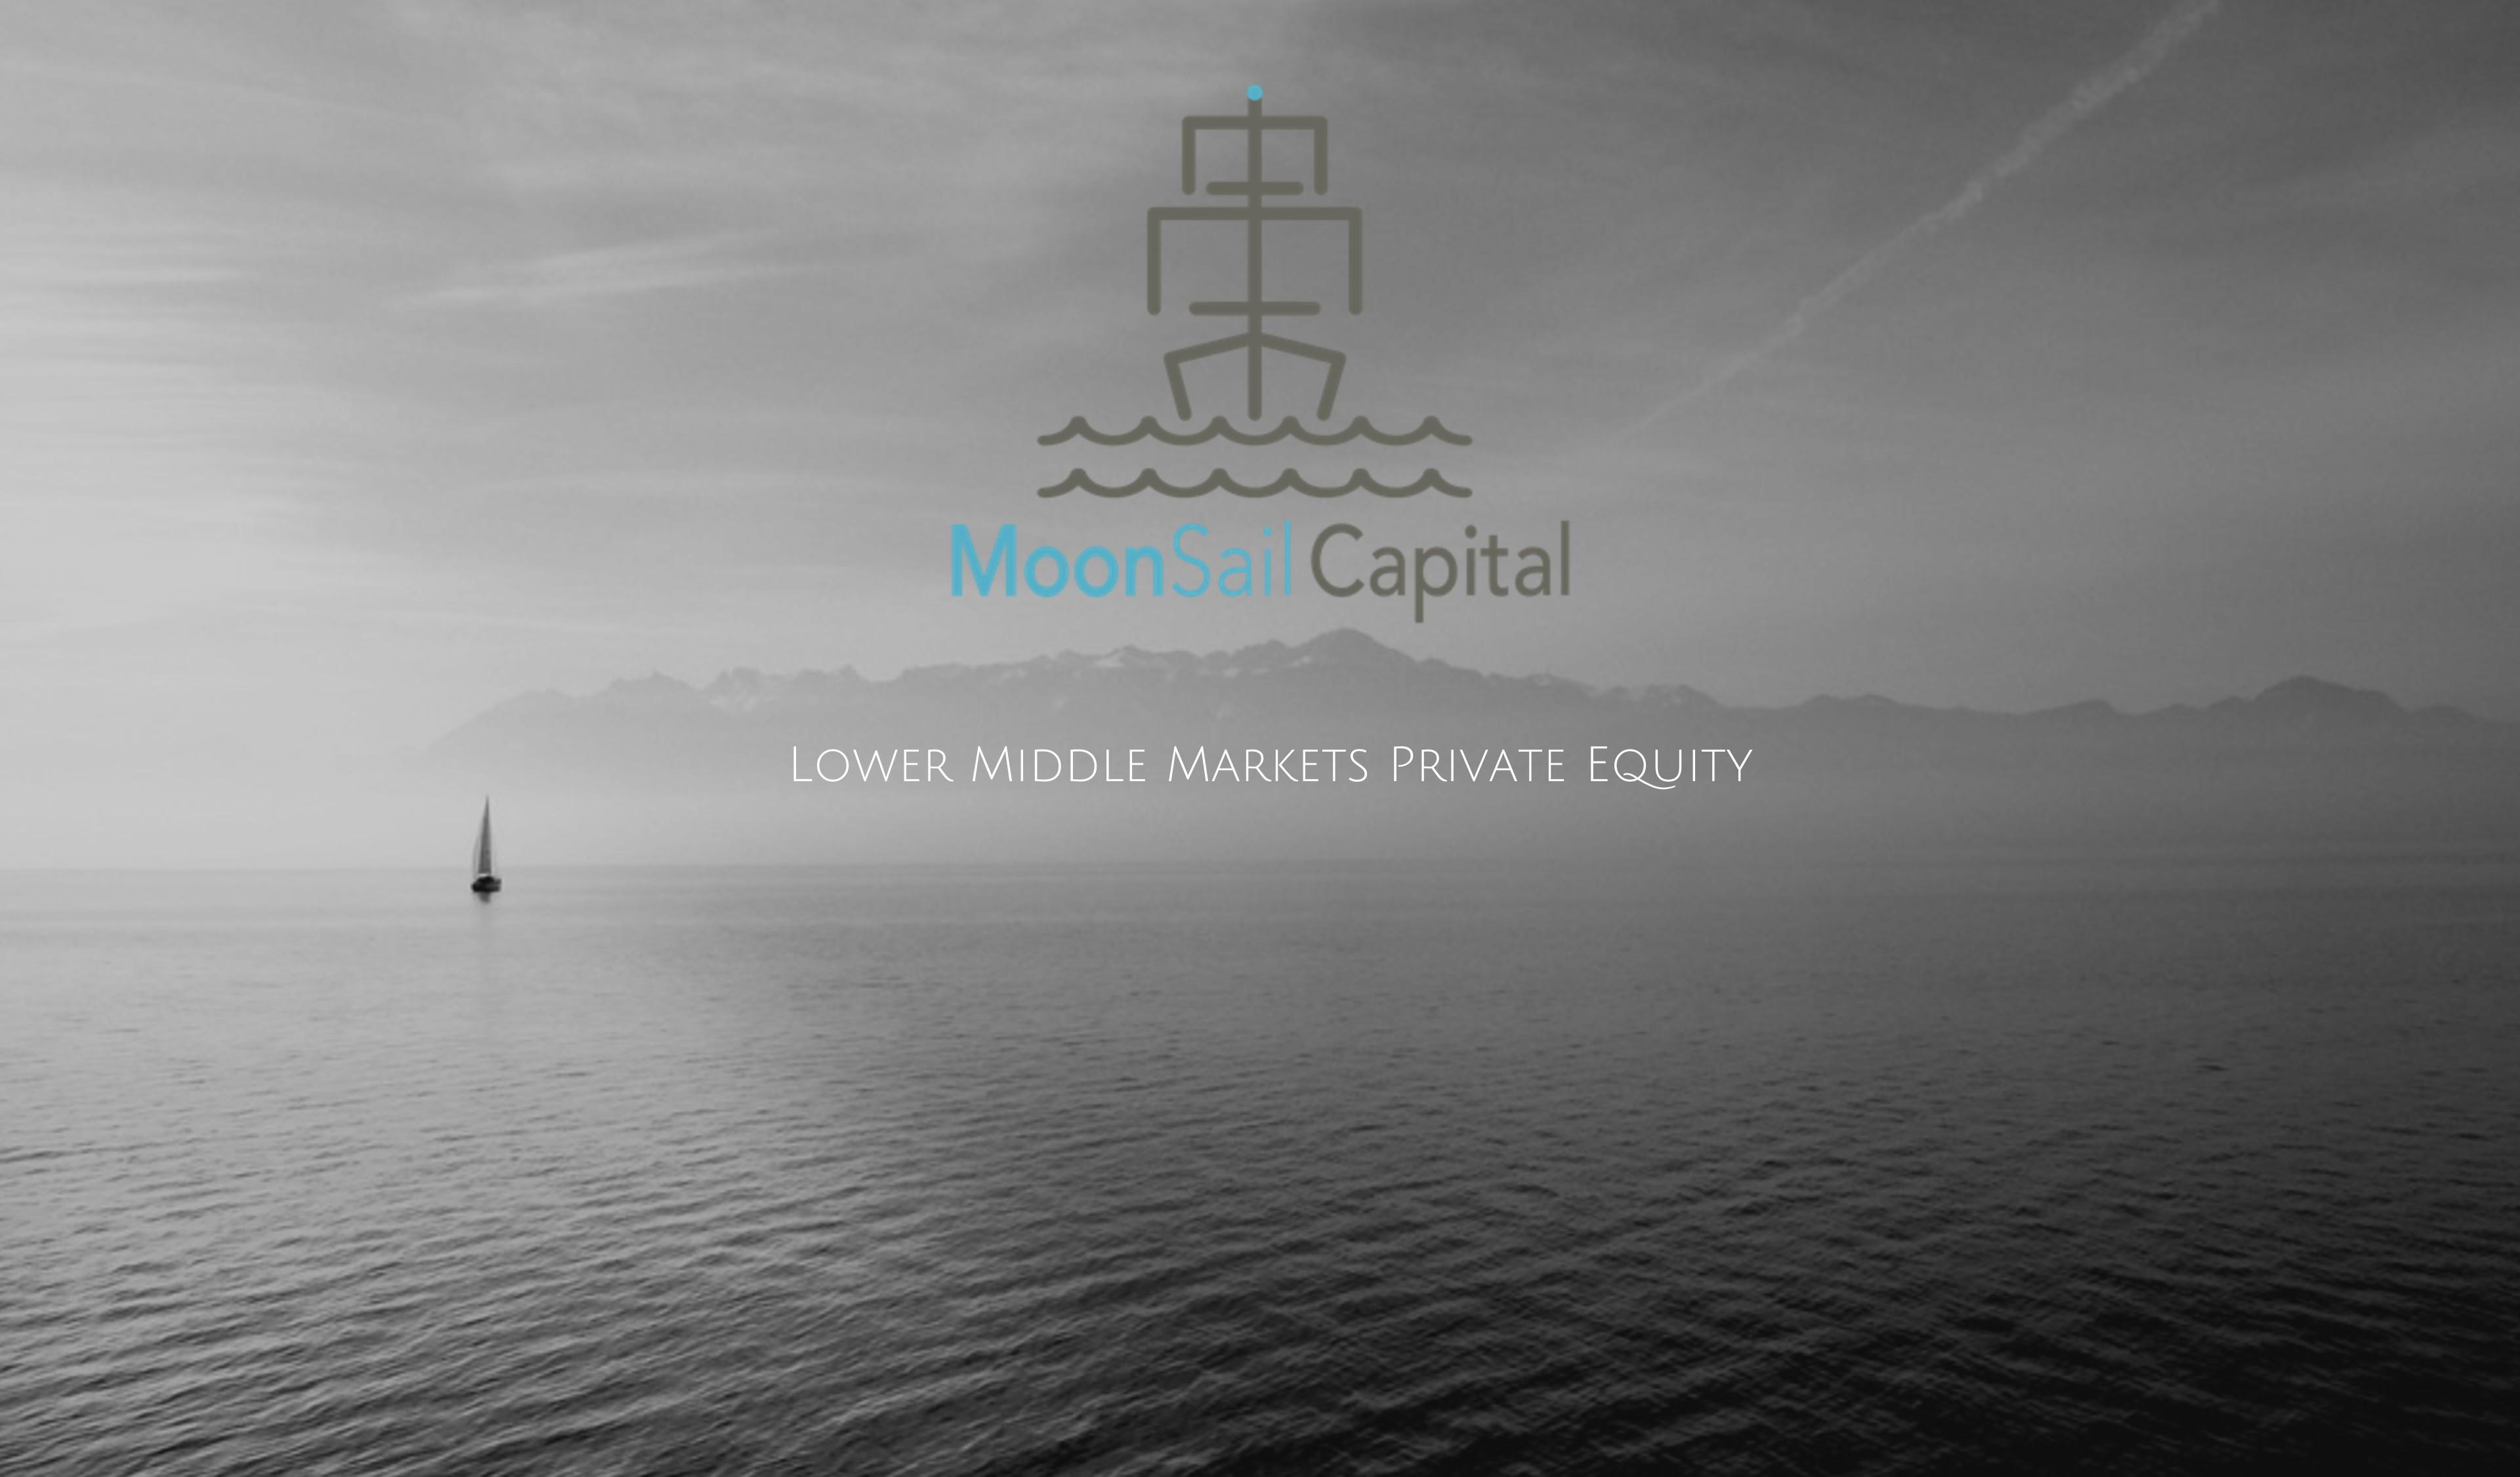 MoonSail Capital | LinkedIn